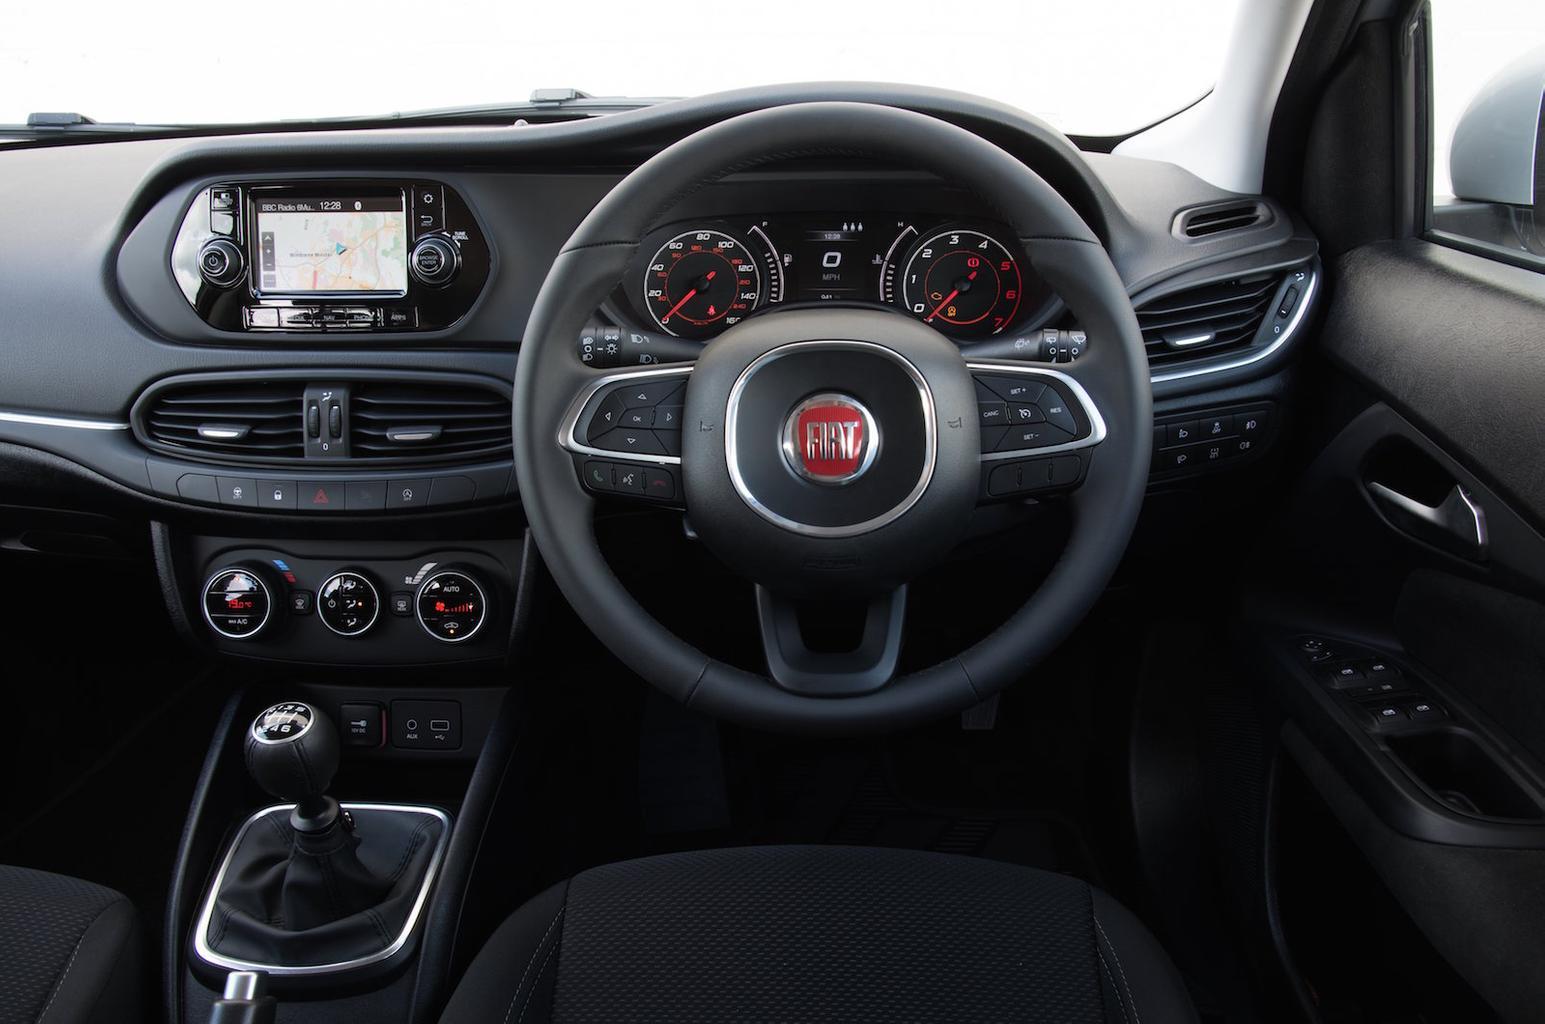 2016 Fiat Tipo 1.6 Multijet II review